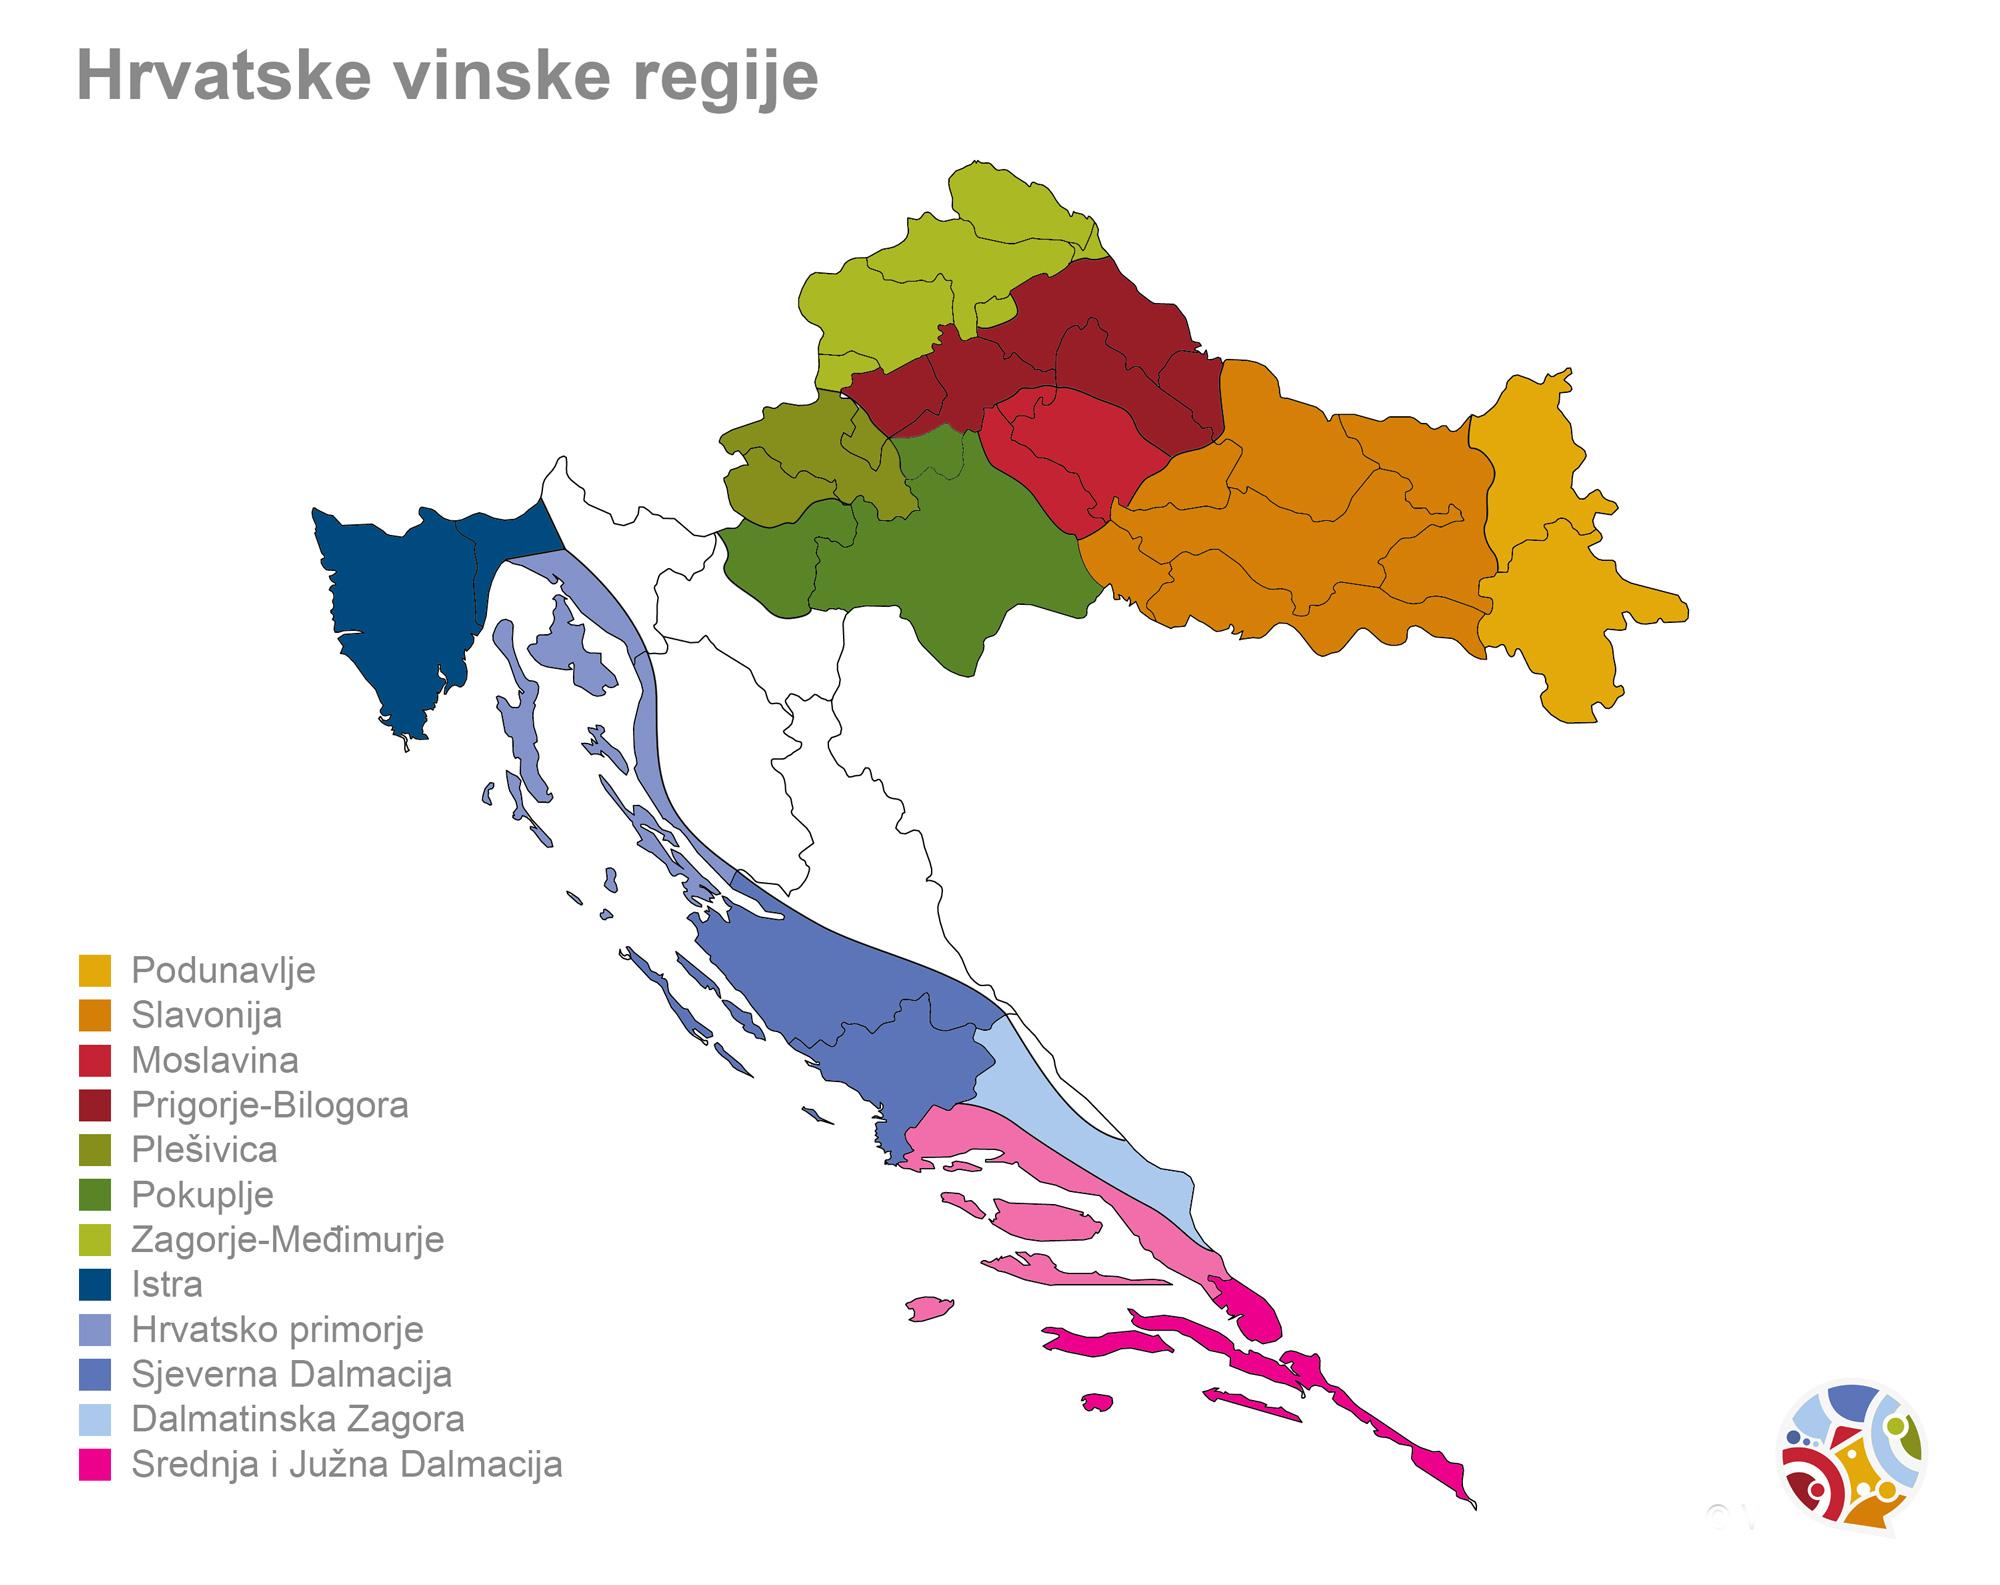 Vinski turizam u Hrvatskoj vinske regije